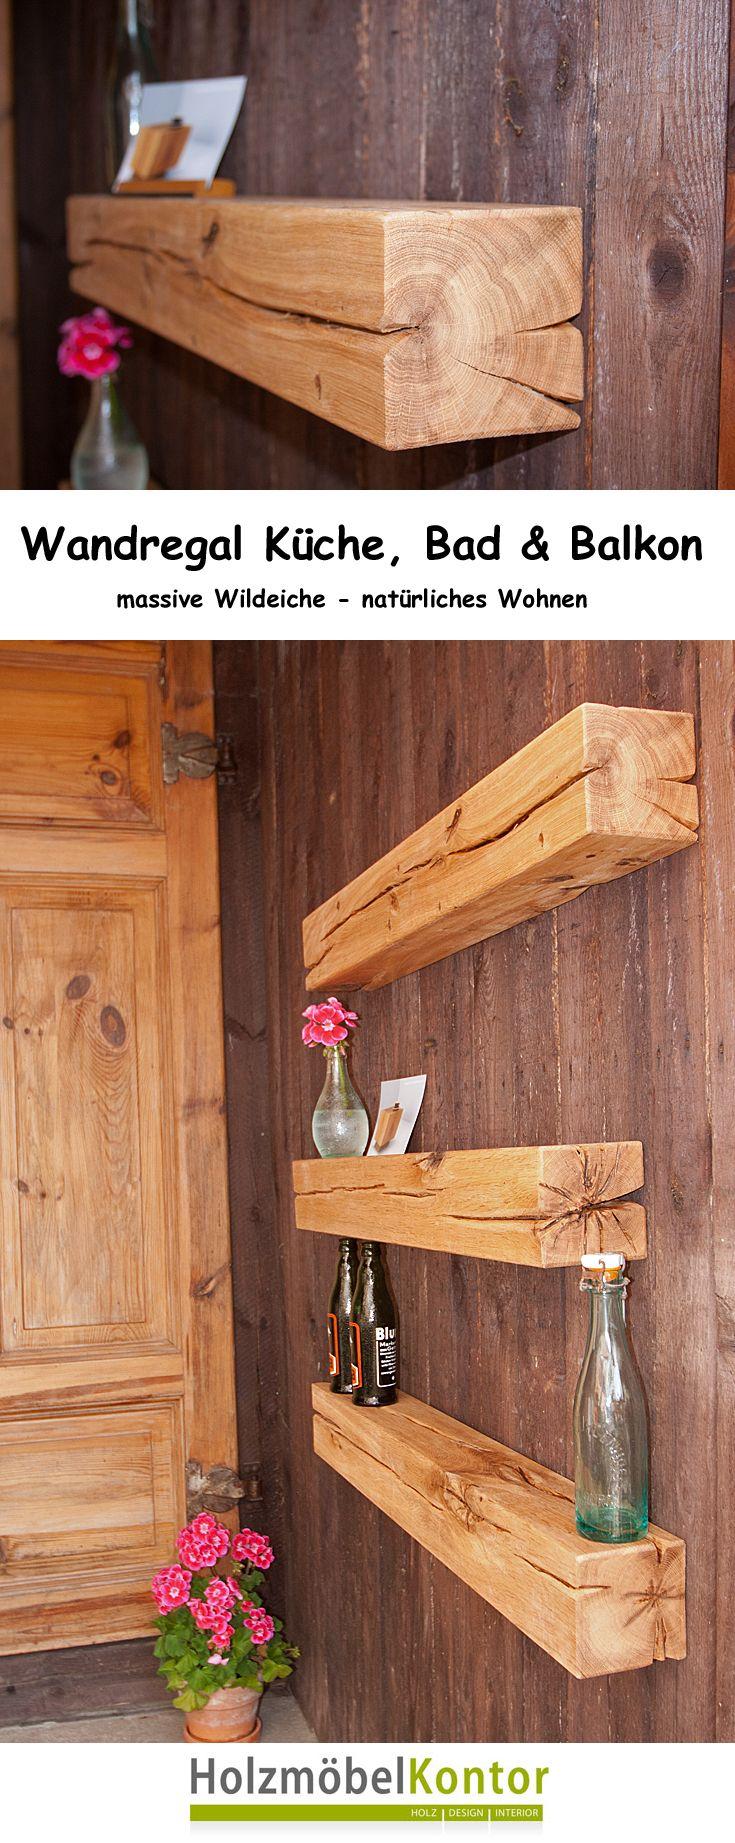 wandboard k che simpel regalsystem k che f r regal wandboard. Black Bedroom Furniture Sets. Home Design Ideas